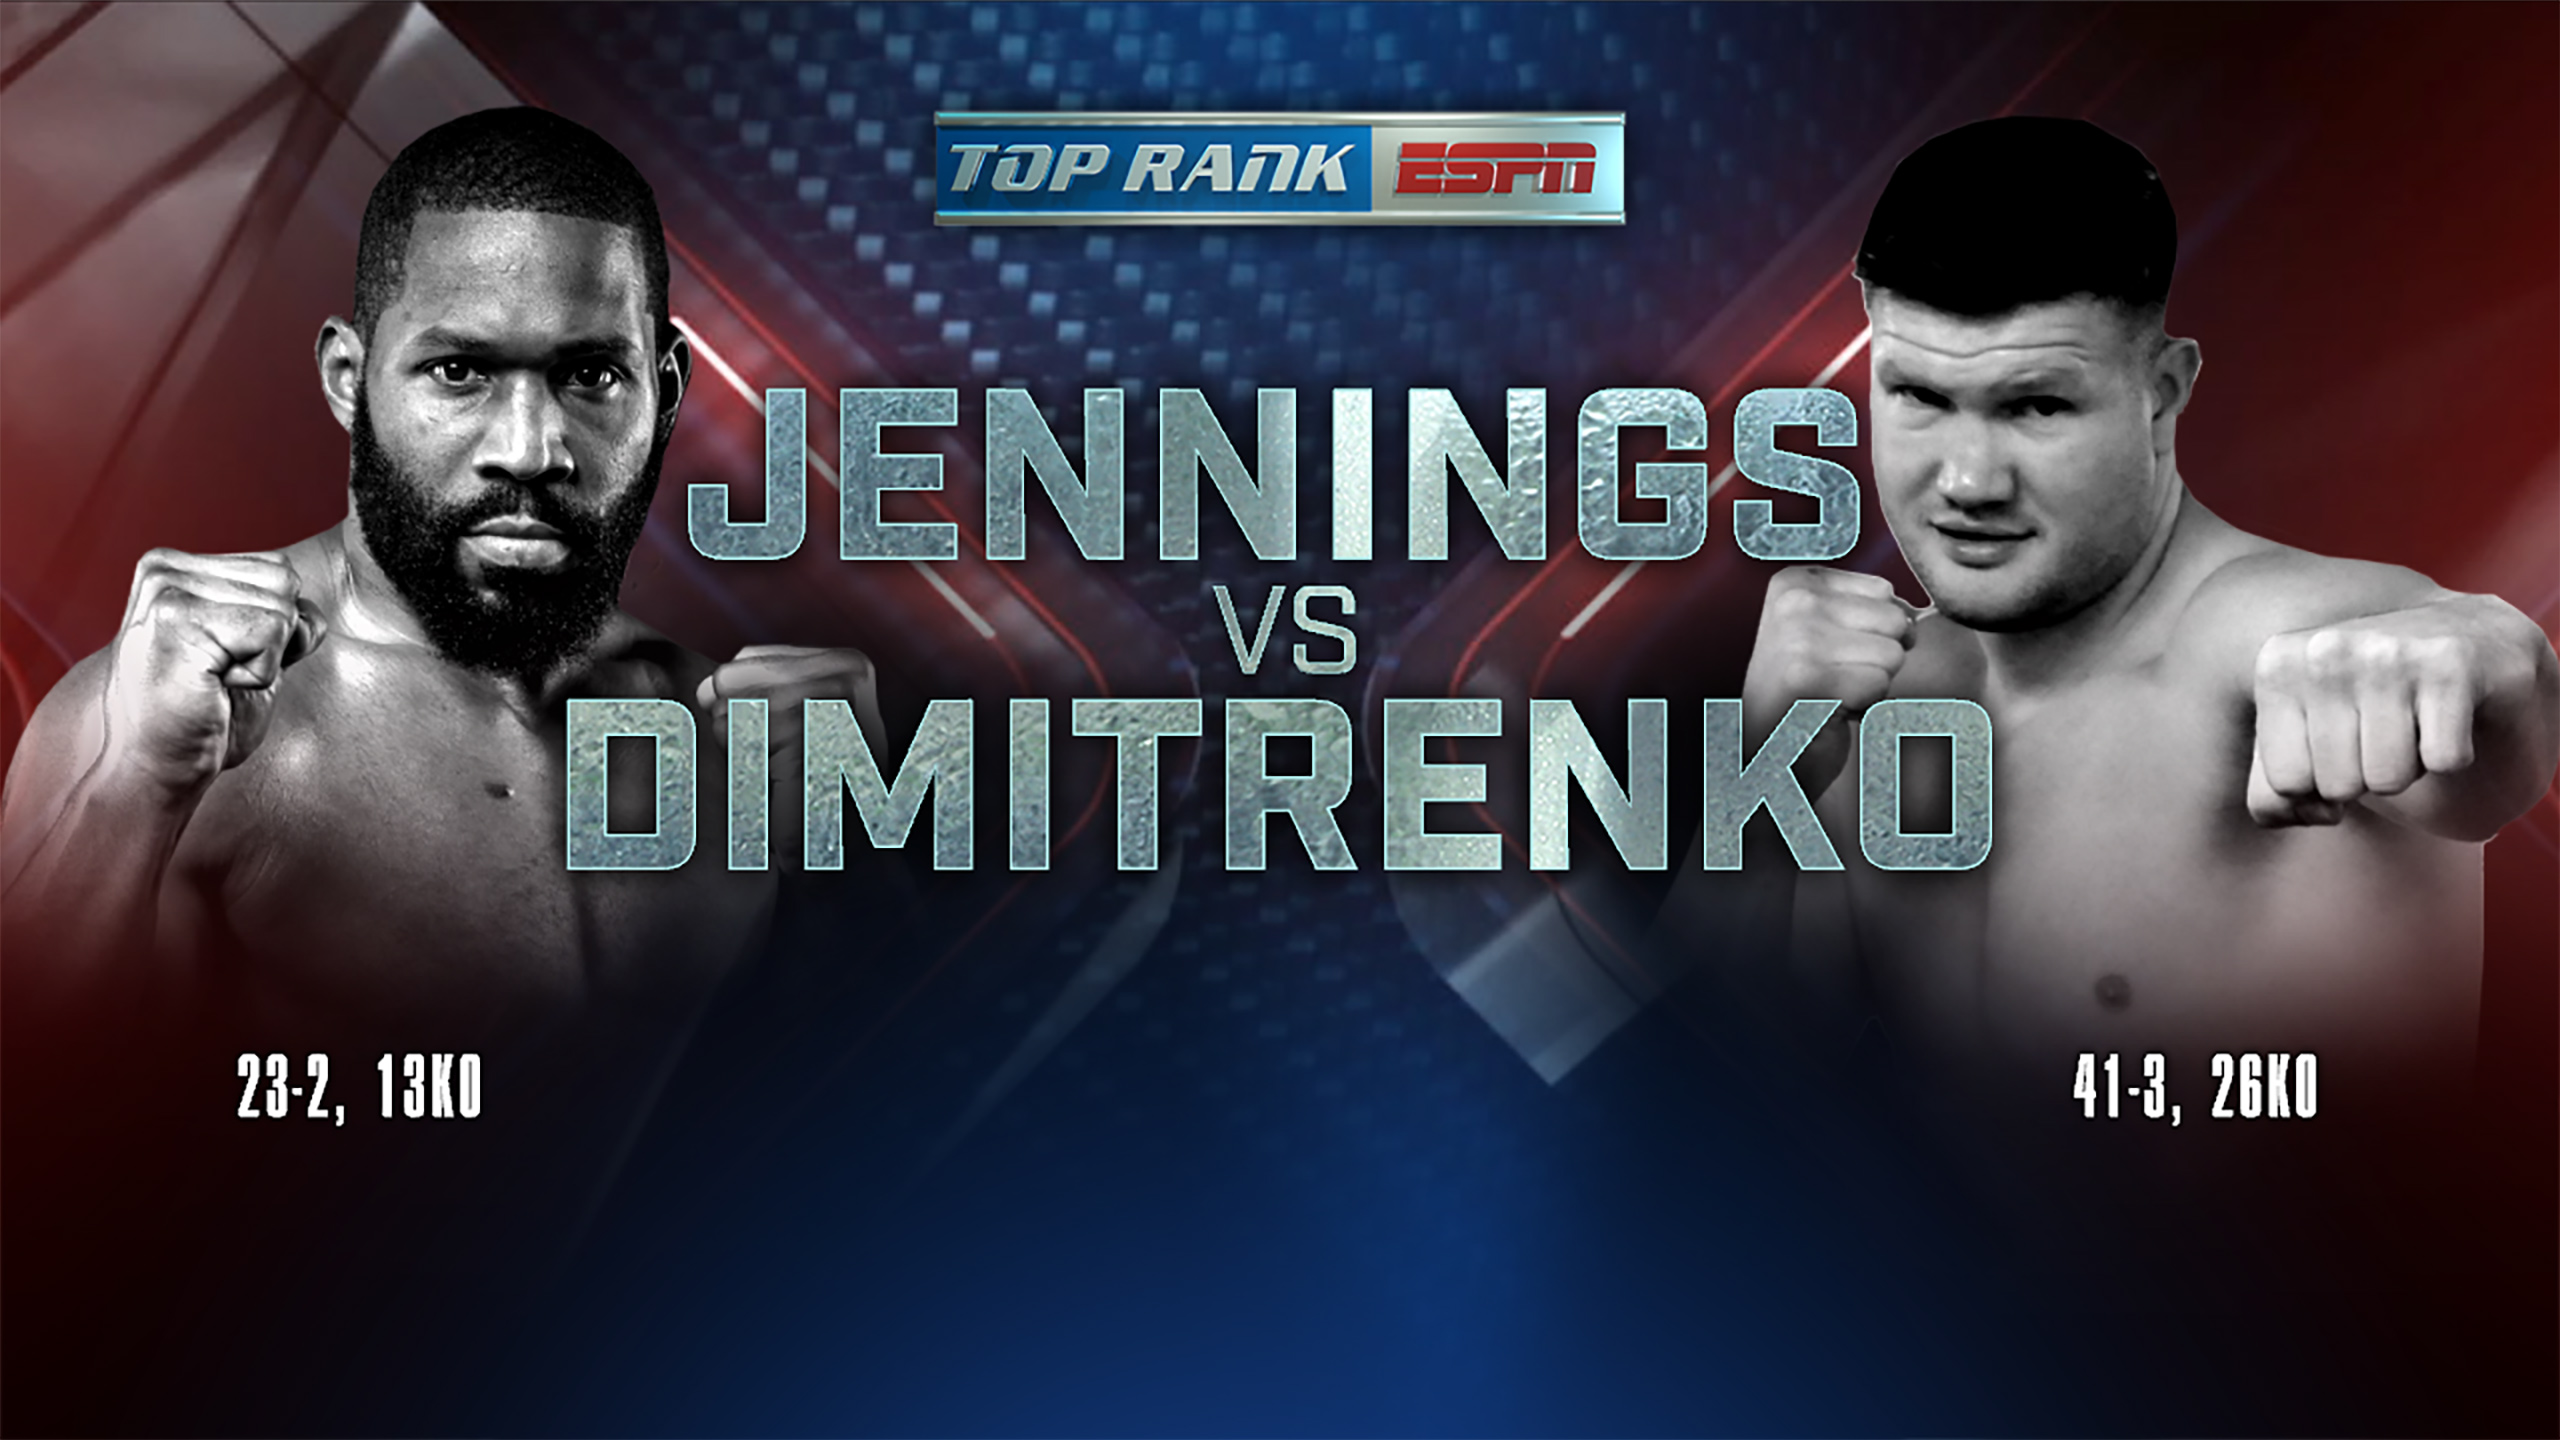 Bryant Jennings vs. Alexander Dimitrenko